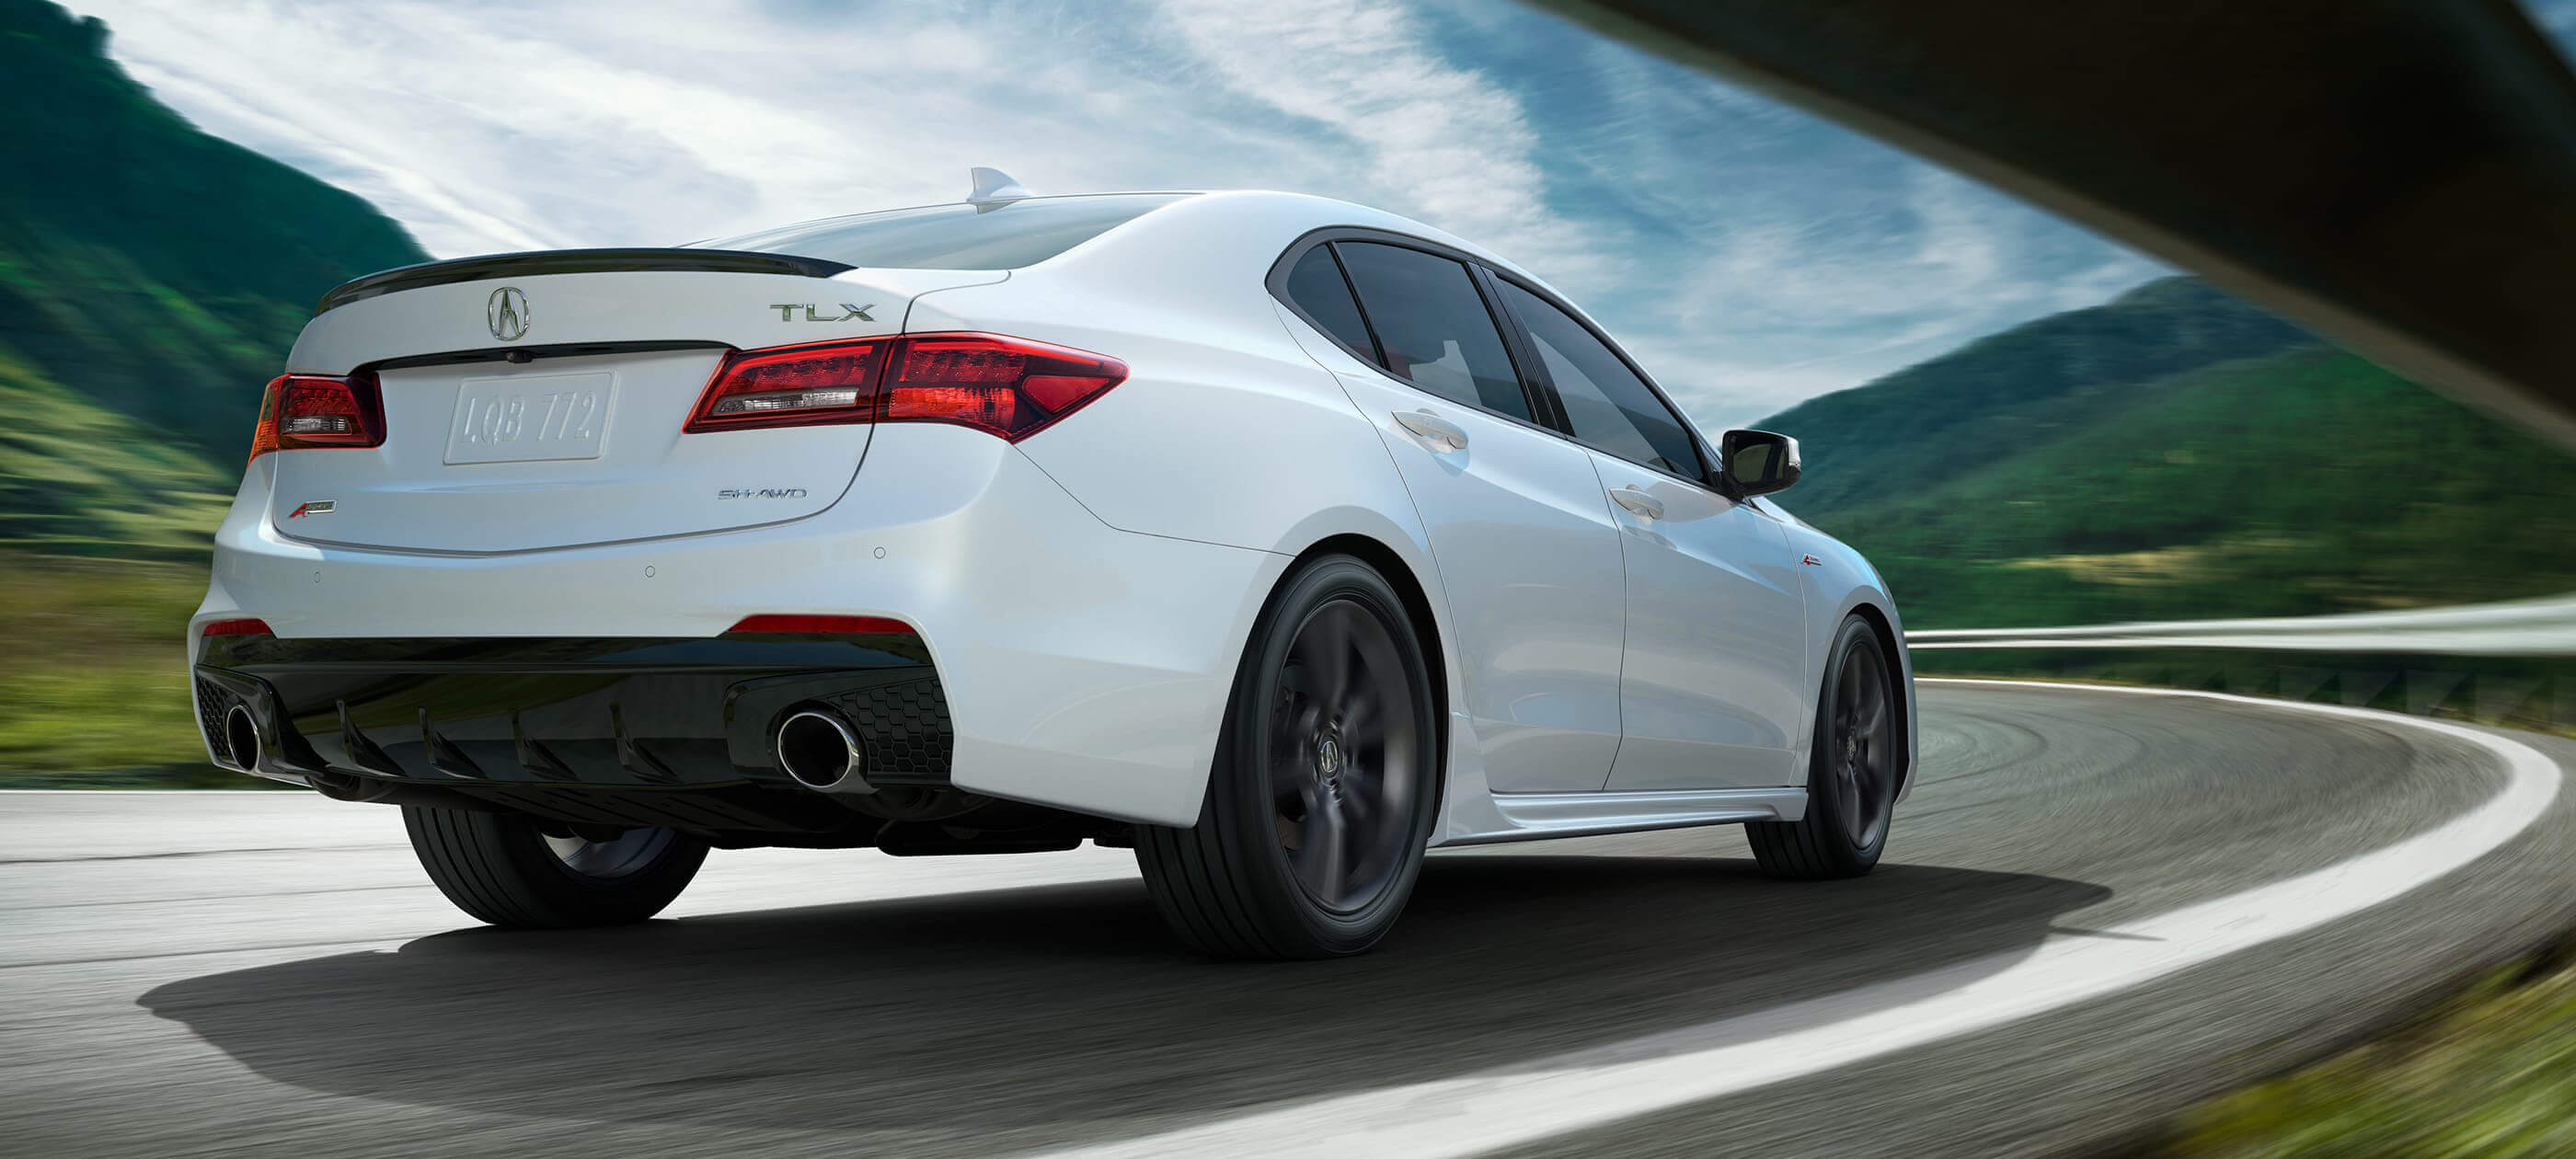 2020 Acura Tlx Central Texas Acura Dealers Performance Luxury Sedan